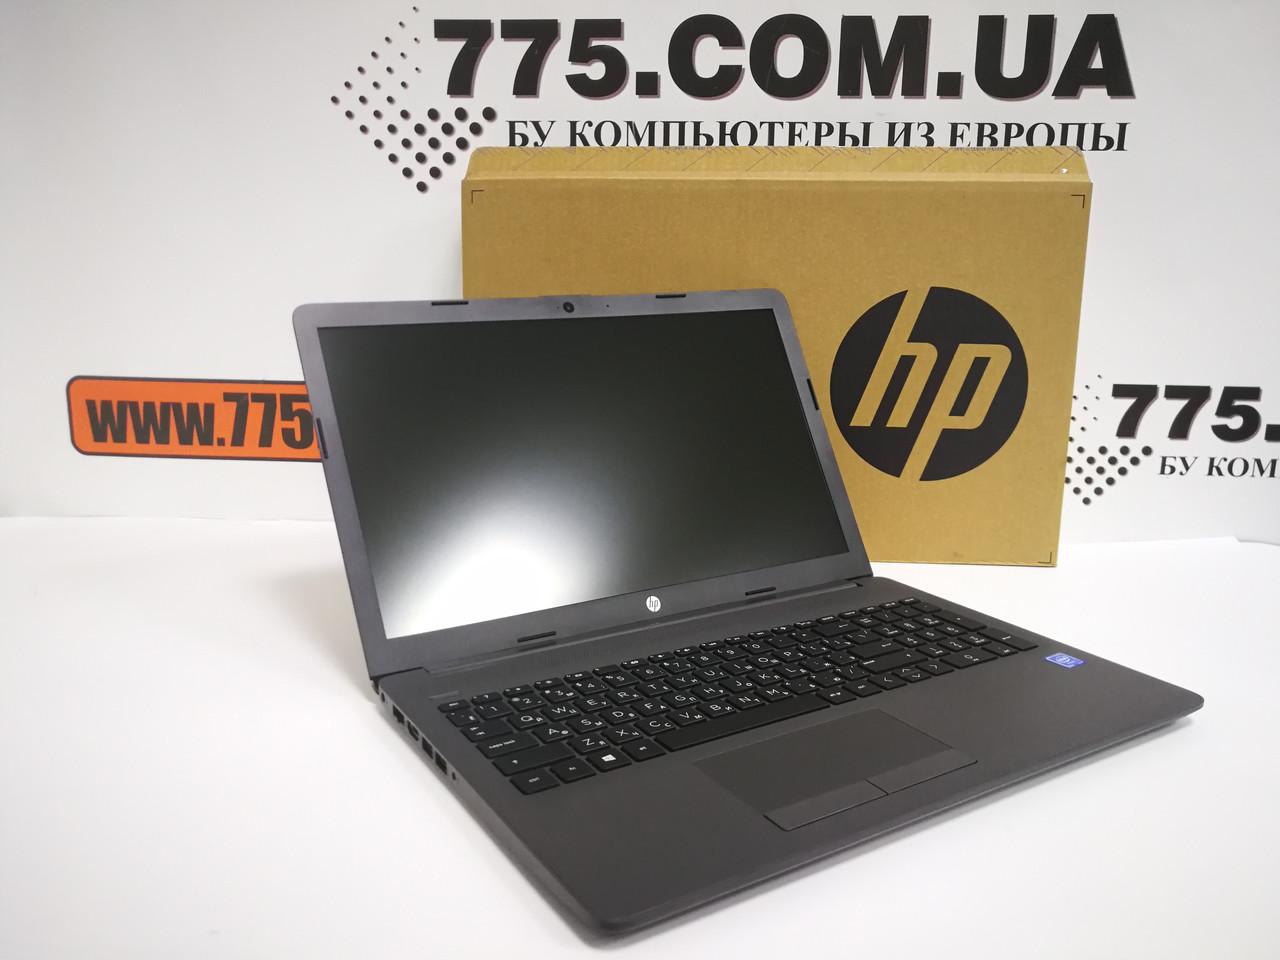 "Ноутбук HP 250 G7, 15.6"", Intel Celeron N4000 2.6GHz, RAM 4GB, SSD 128GB, Новый"